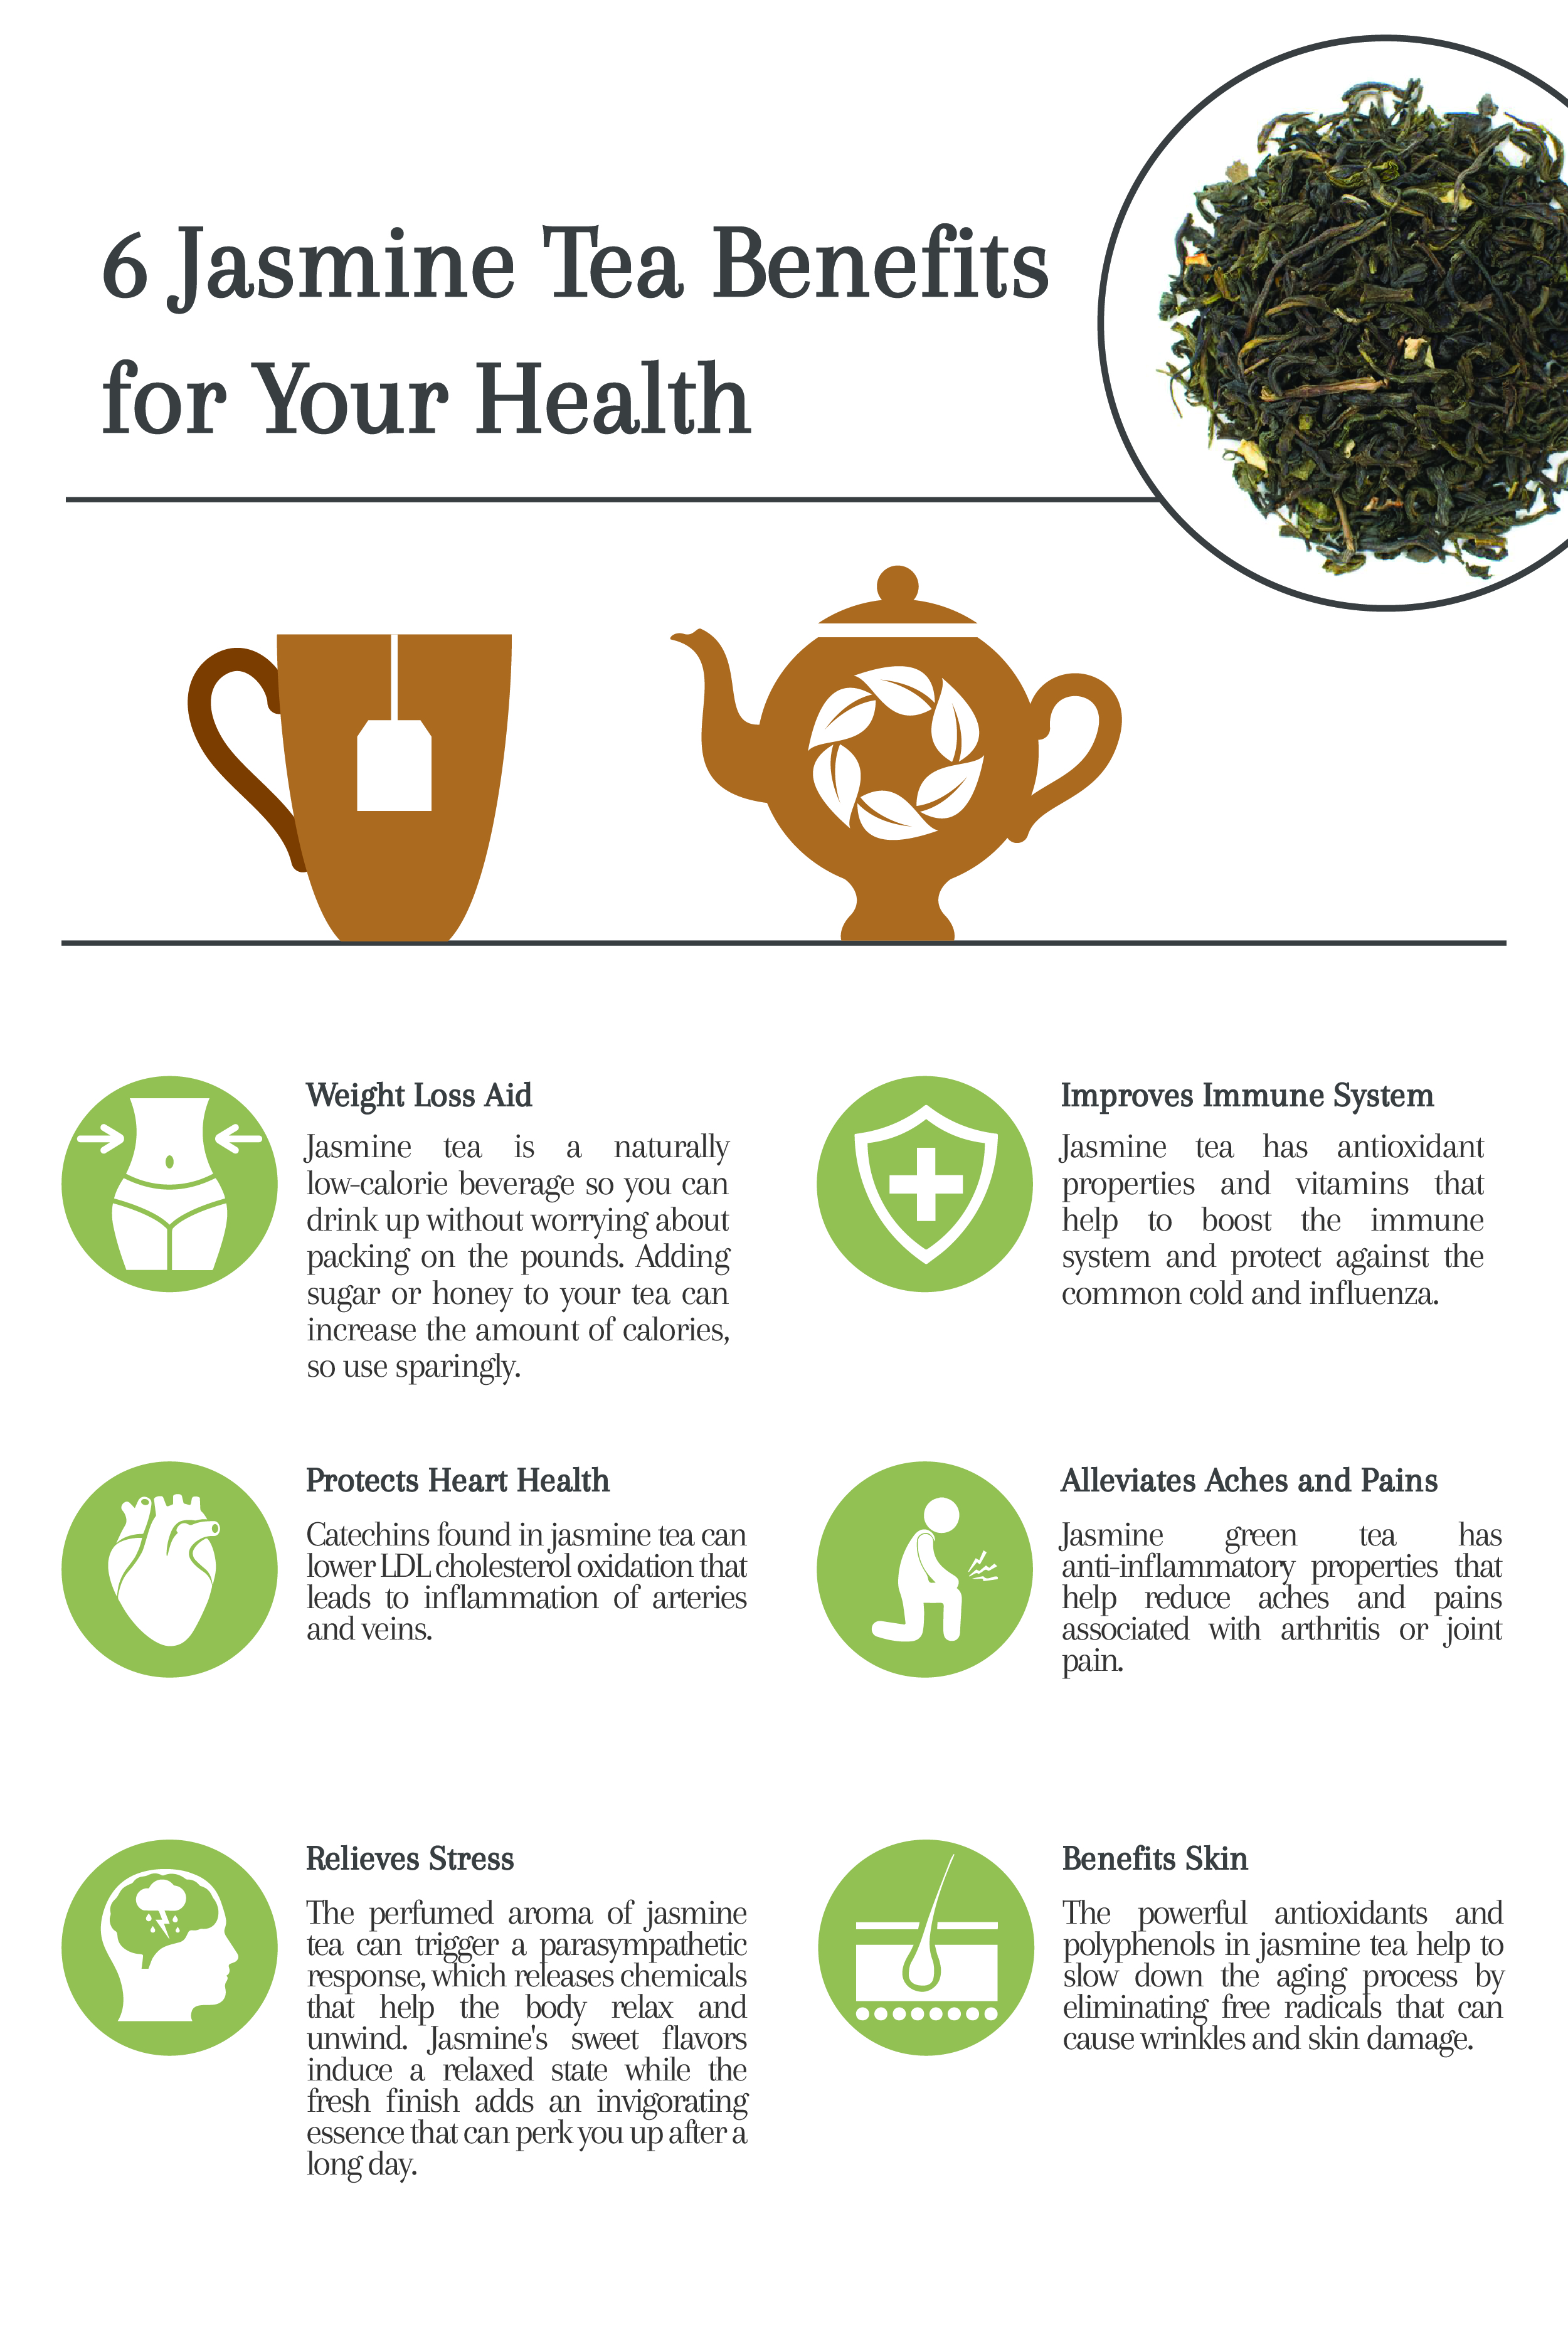 9 Jasmine Tea Benefits for Your Health - Cup & Leaf